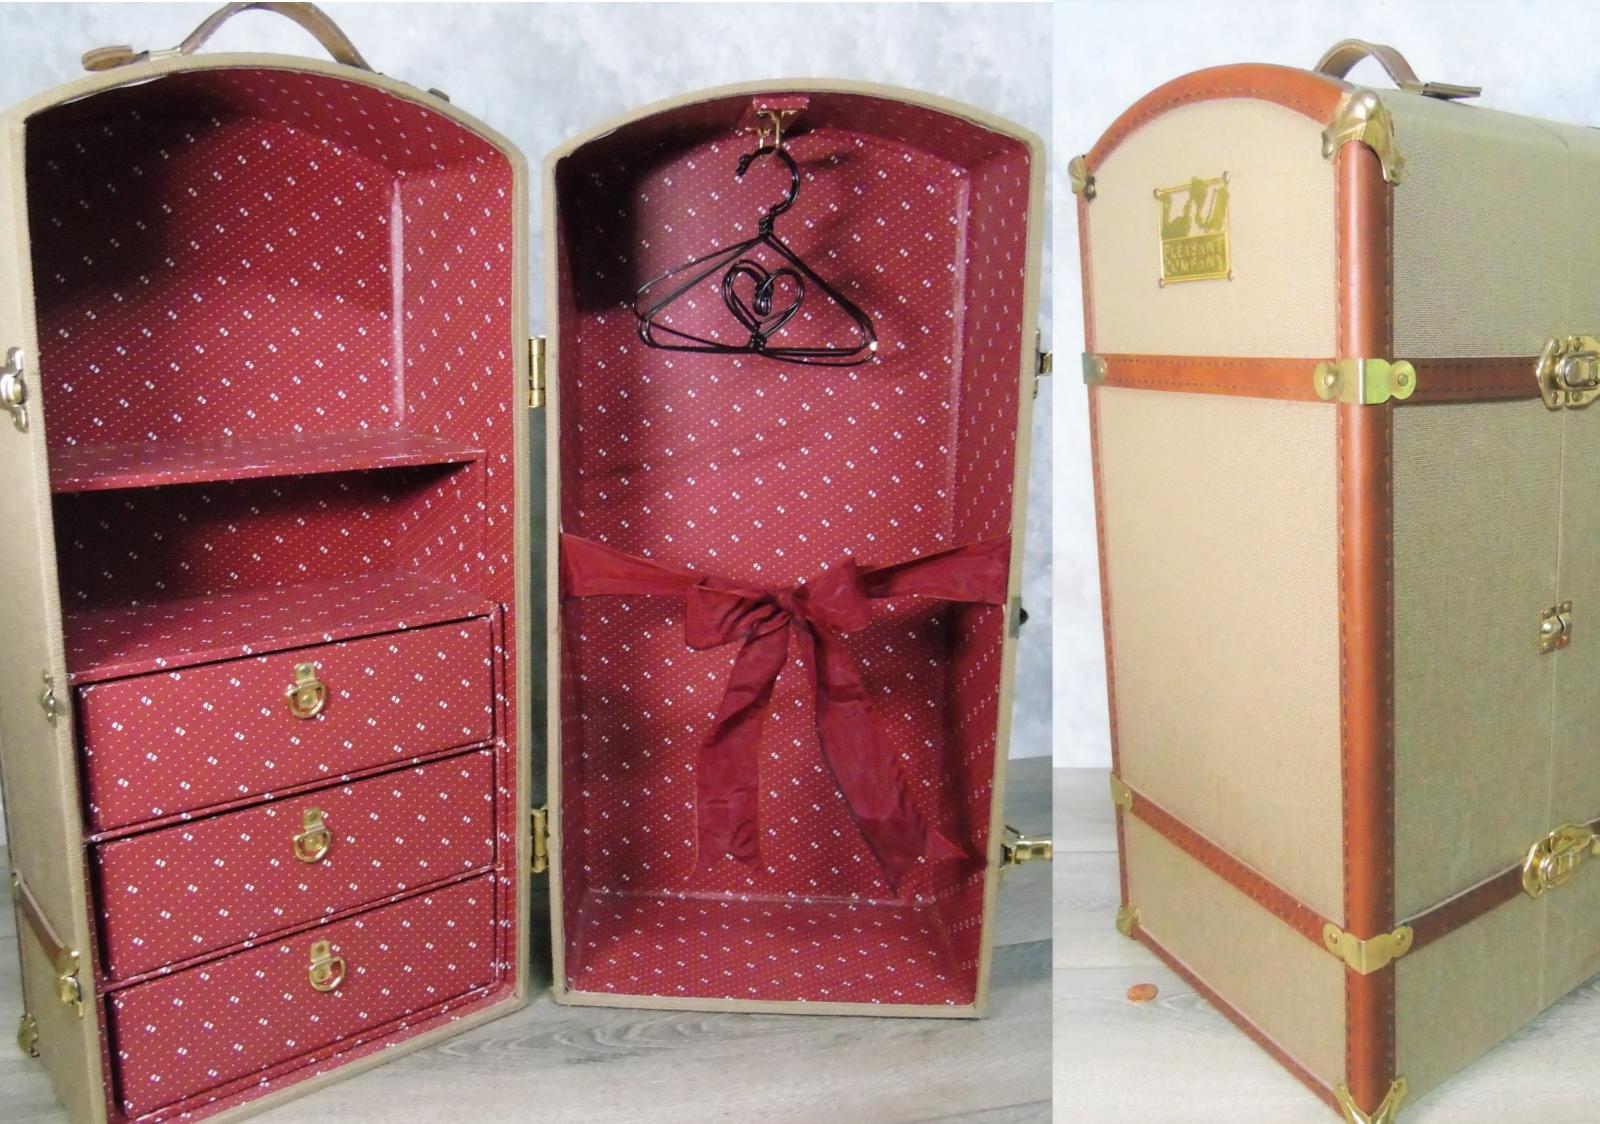 American Girl Pleasant Company Samantha Puppe Dämpfer Koffer Wardrobe Closet